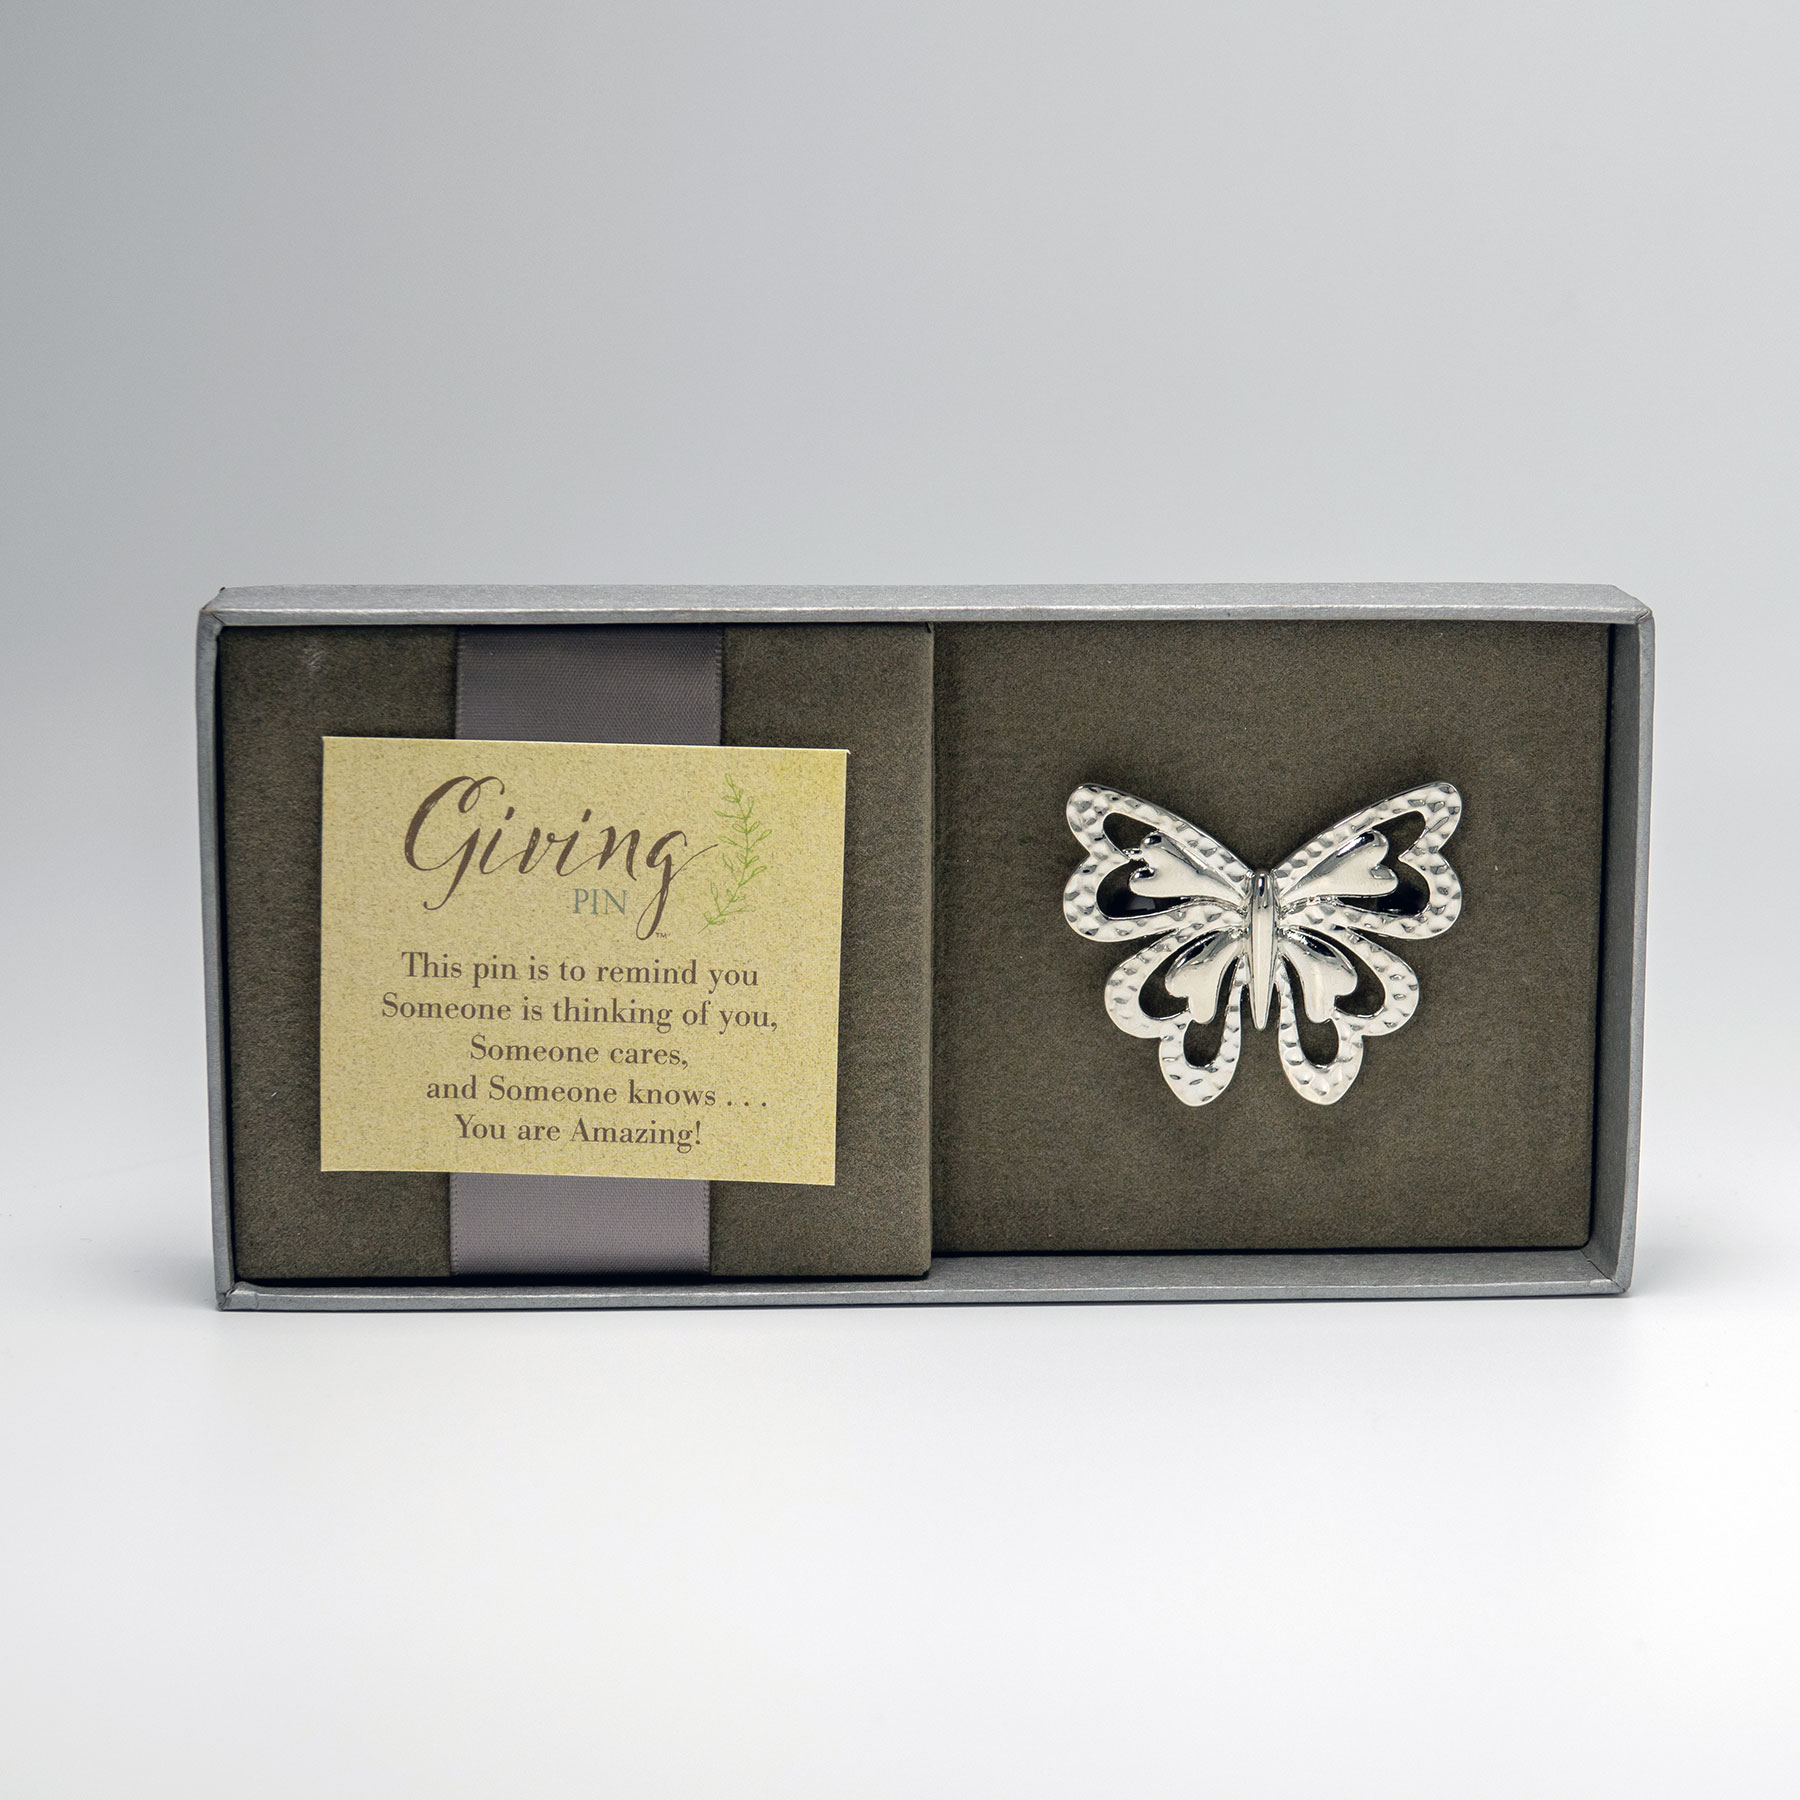 Giving-Pin_02-lr